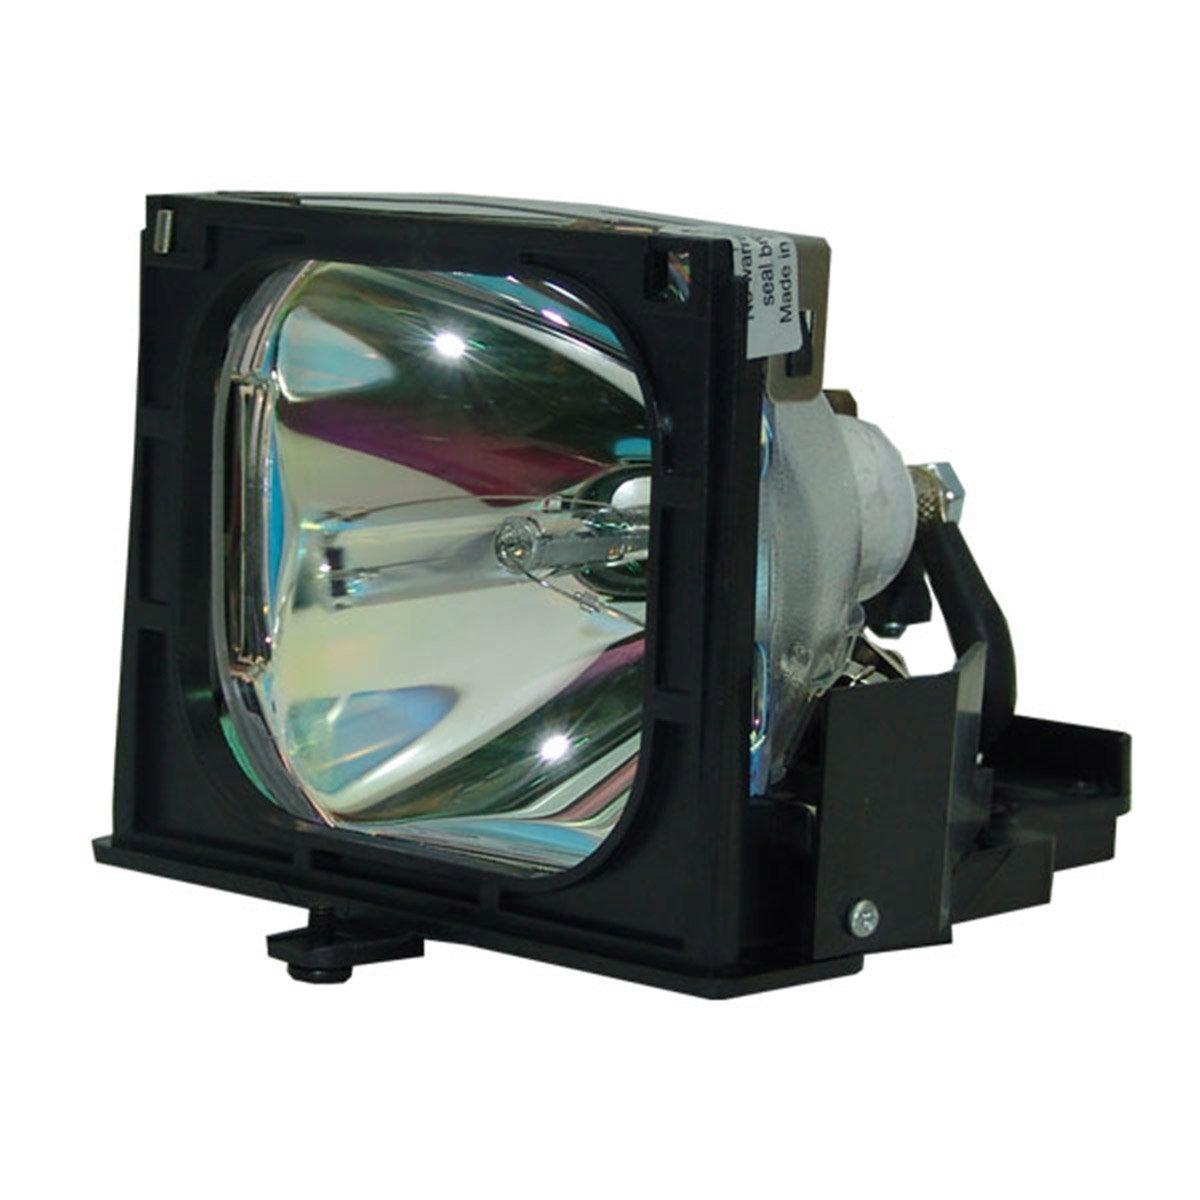 LCA3111 for PHILIPS CBRIGHT SV1 SV2 PLUS SV20b SV20i Projector Lamp Bulb with housing pureglare compatible projector lamp for philips cbright xg2